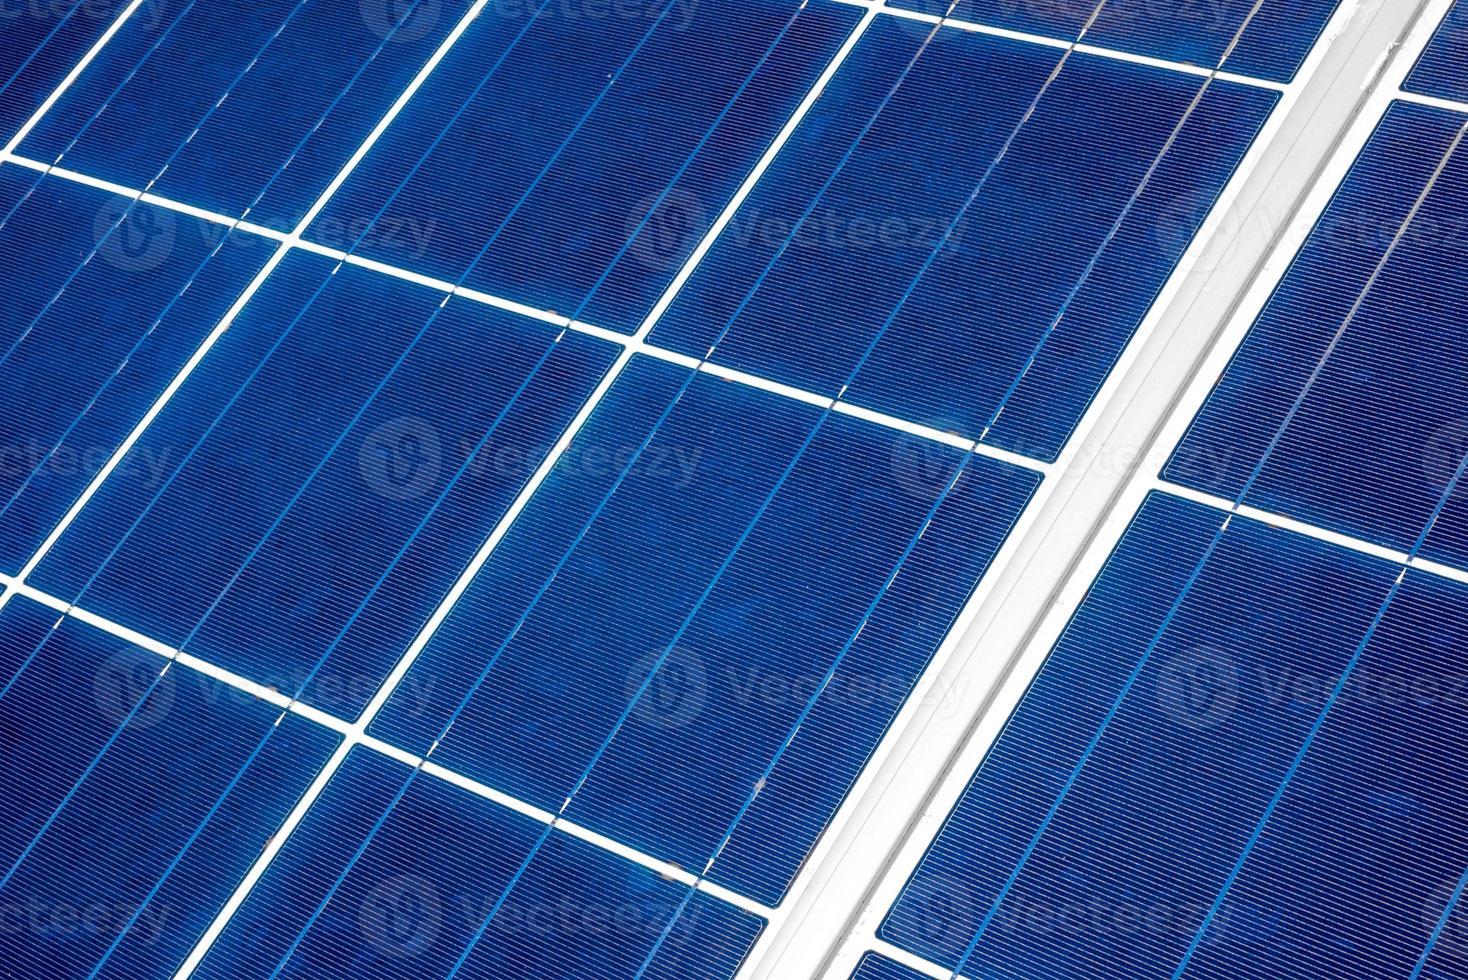 Solarpanel aus nächster Nähe foto